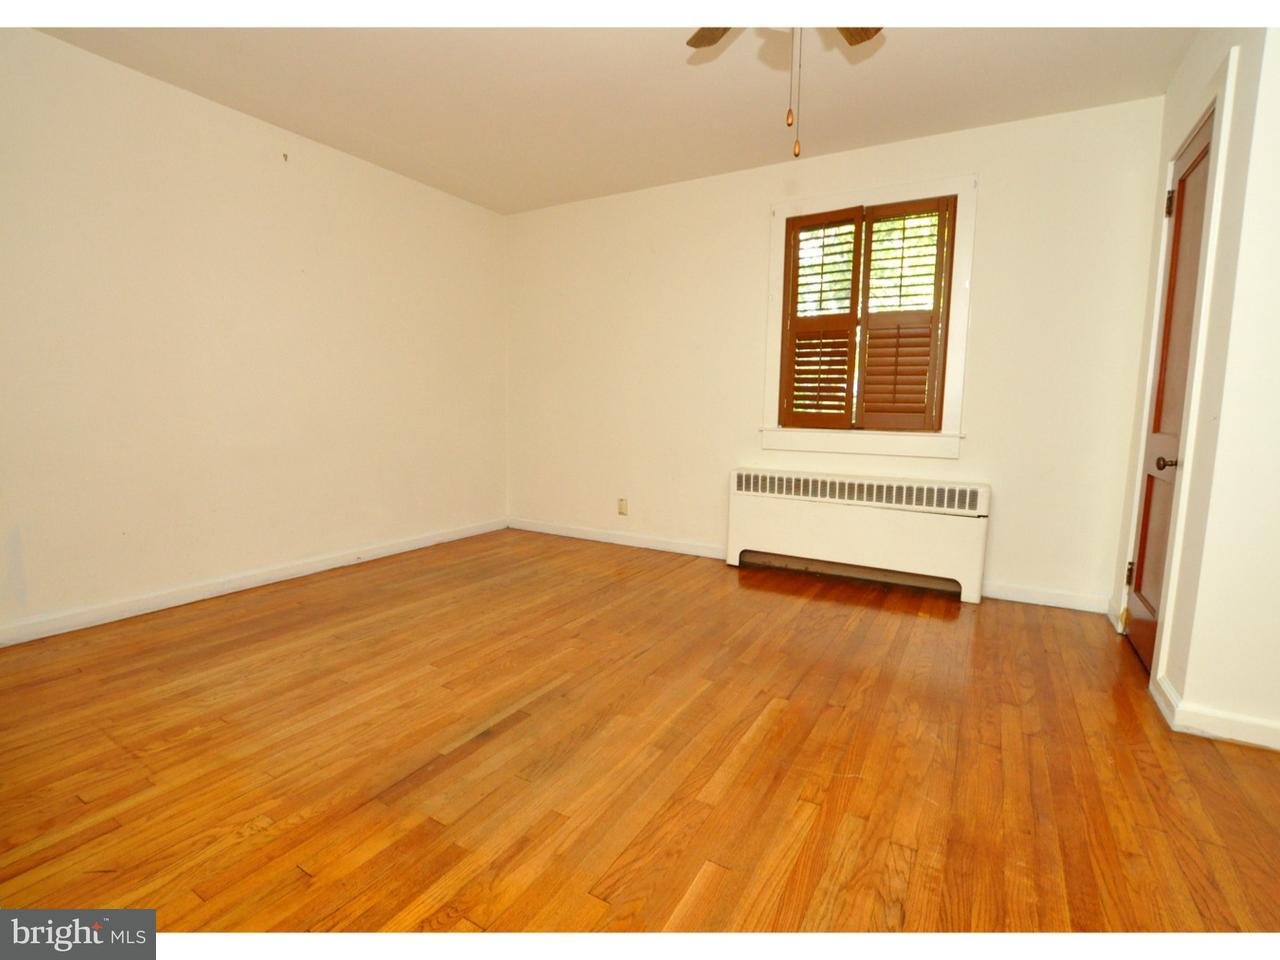 Additional photo for property listing at 156 W CENTRAL Avenue  Moorestown, Нью-Джерси 08057 Соединенные Штаты